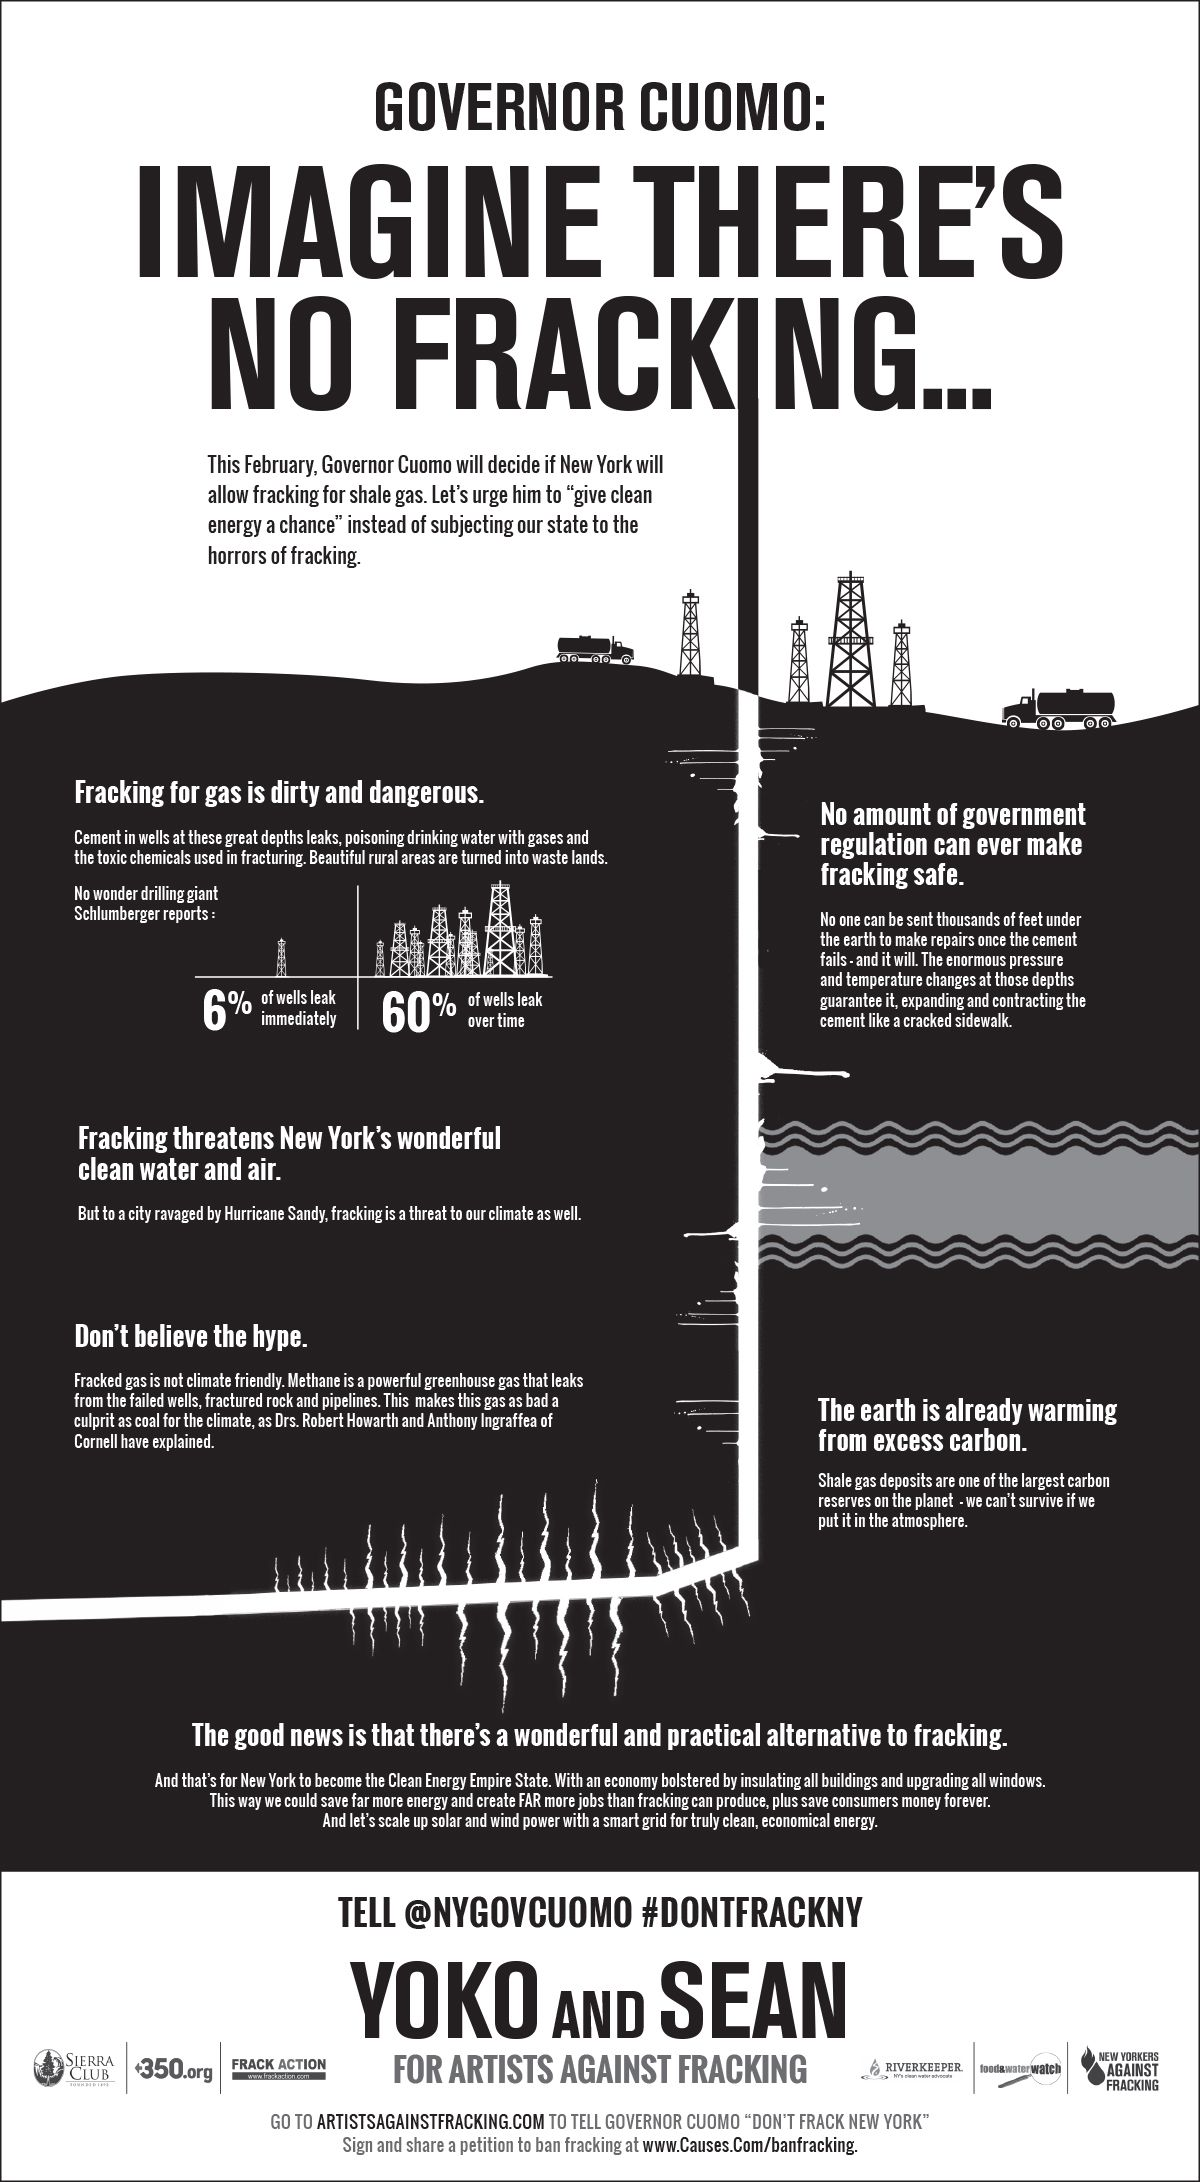 Tell Governor Cuomo Don T Frack New York Artists Against Fracking Causes Com Anti Fracking Sean Lennon Video Contest